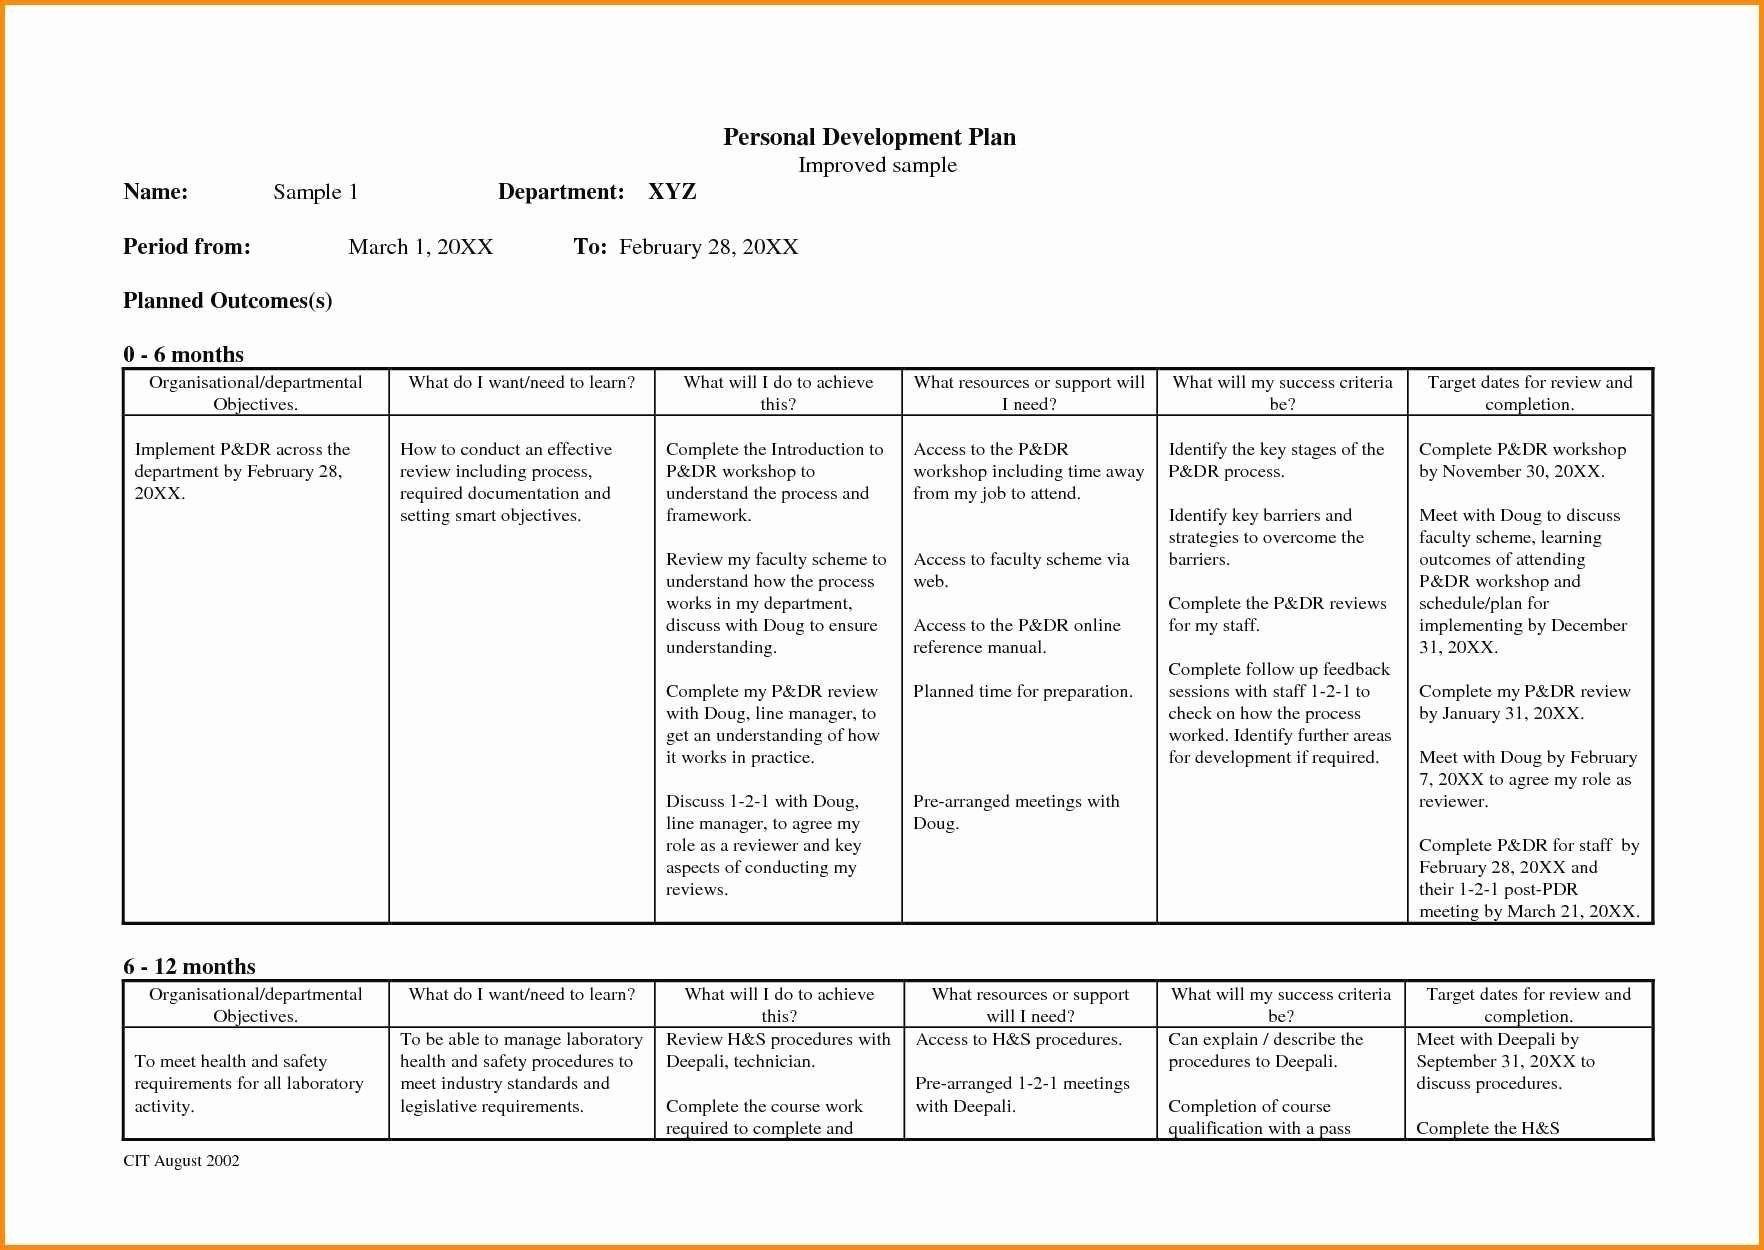 Strategic Planning For Nonprofits Template Awesome Fresh Sample Strategi Personal Development Plan Template Personal Improvement Plan Personal Development Plan Strategic plan template for nonprofits